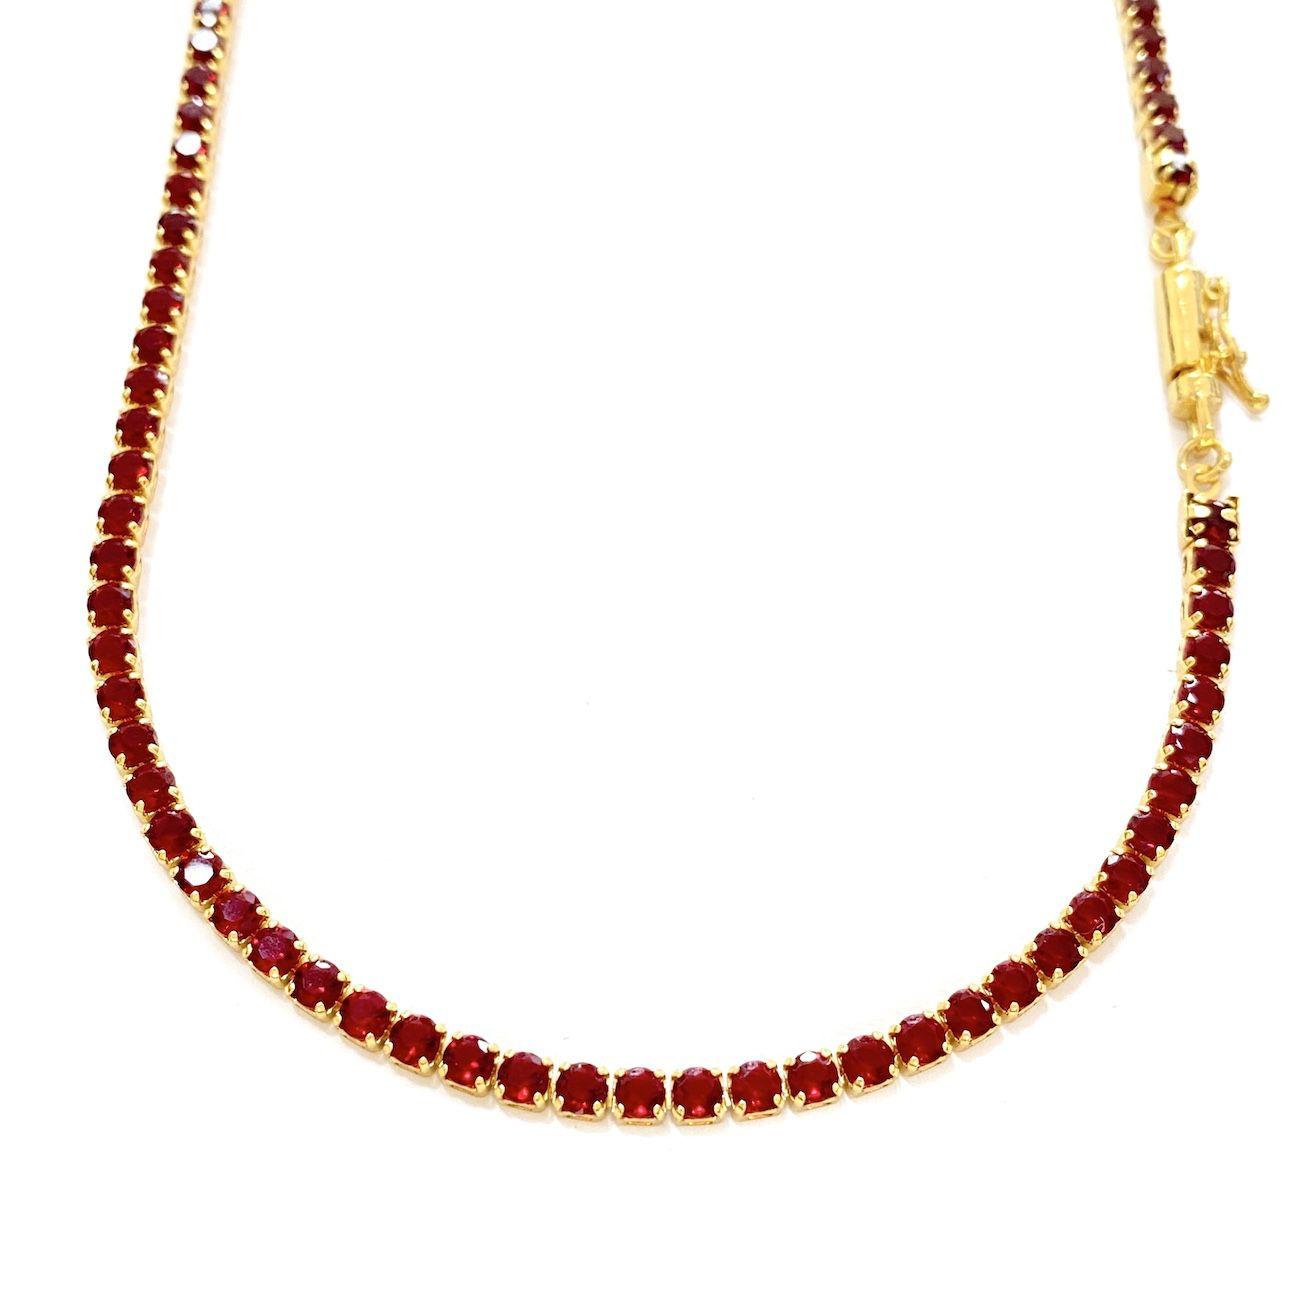 Corrente Riviera Tennis Chain 3mm 70cm 14,8g (Pedra Zircônia Vermelha) (Banho Ouro 18k)